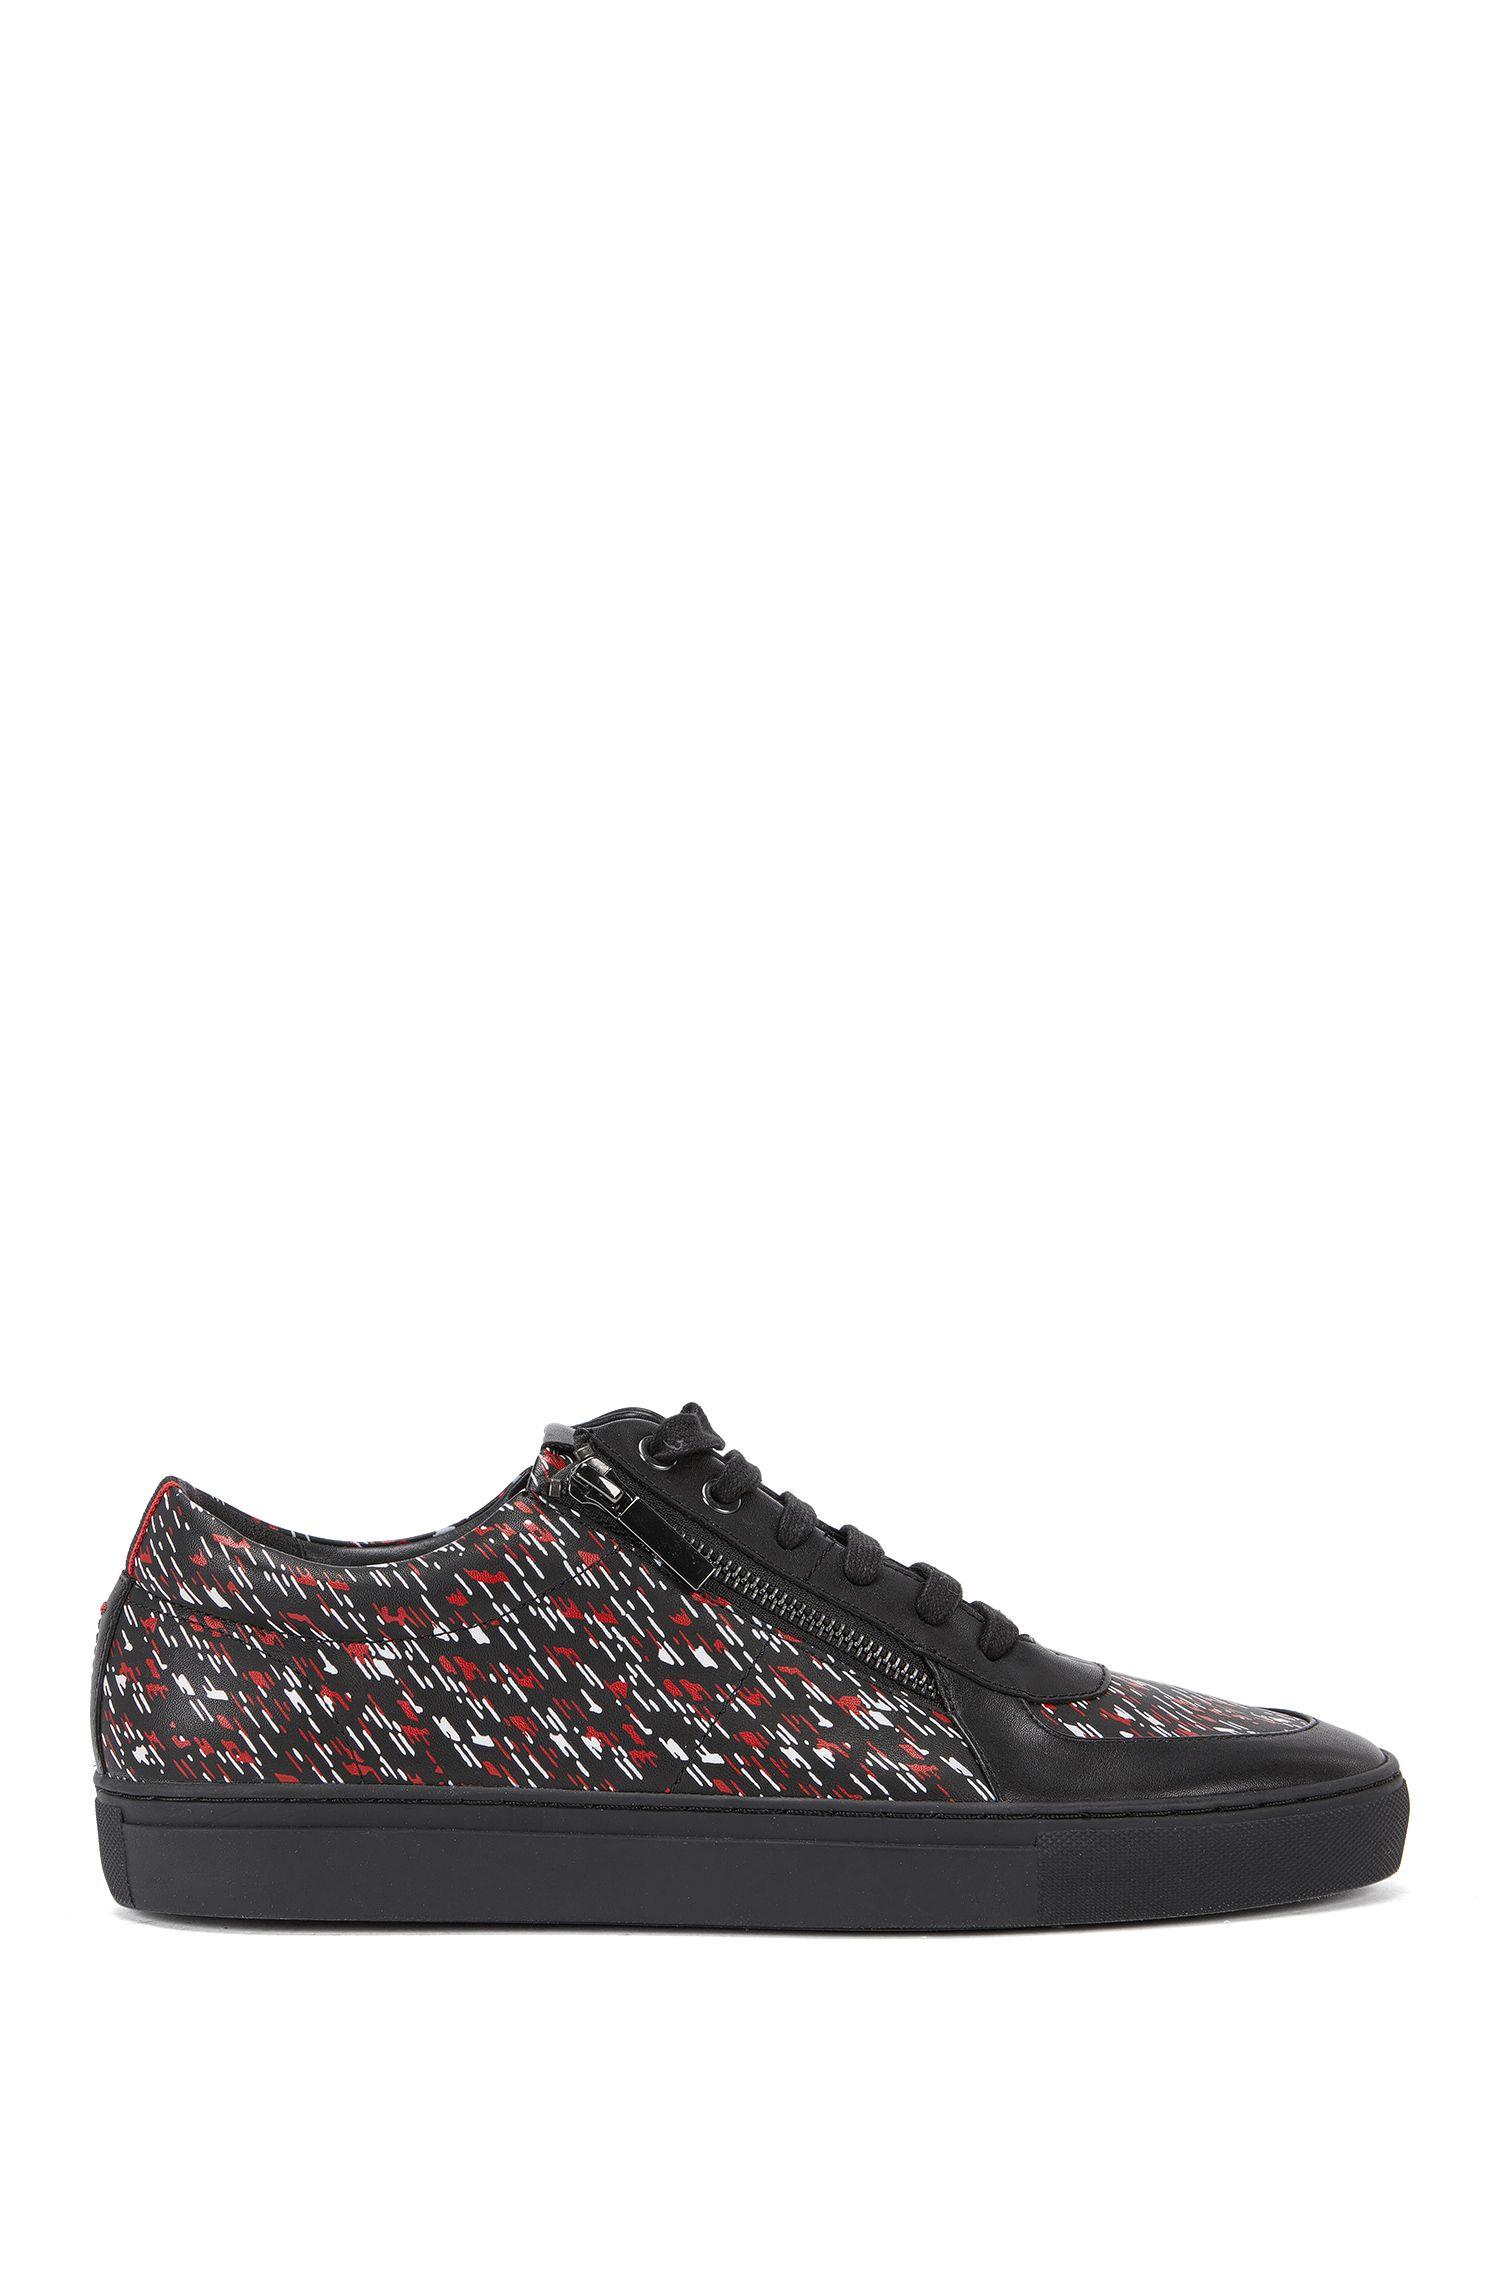 Sneakers aus Print-Leder